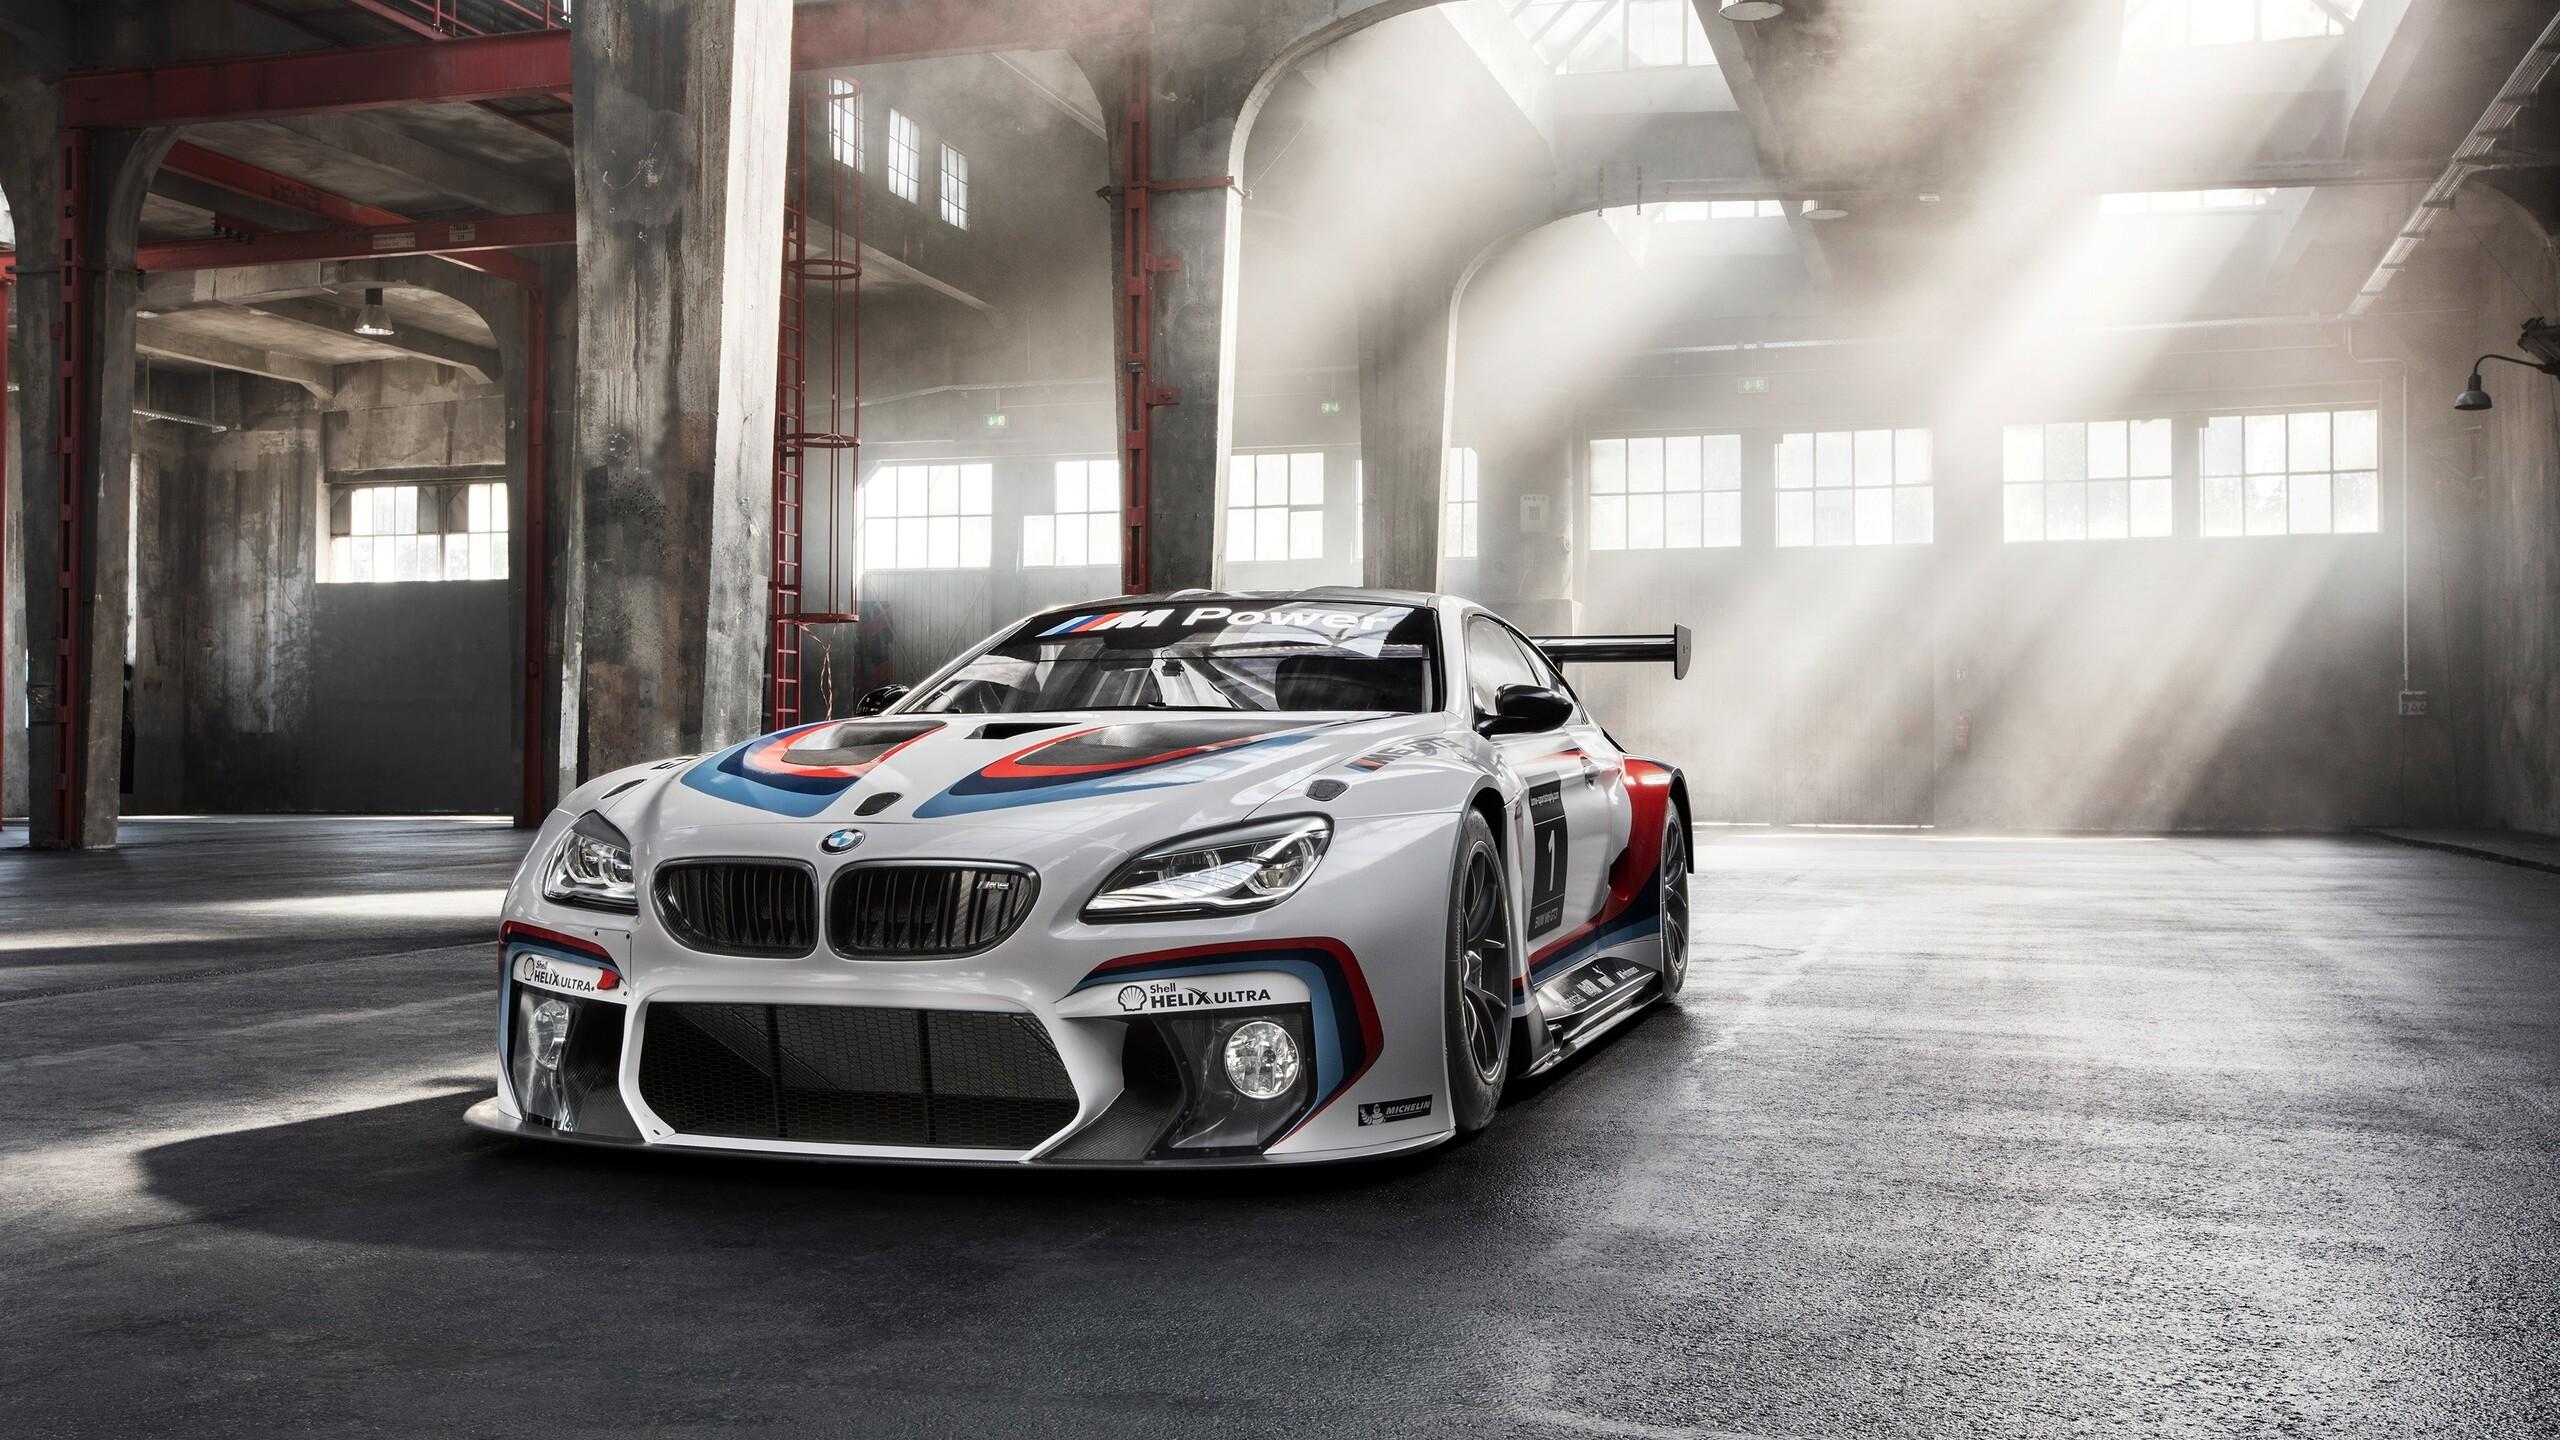 2560x1440 Bmw M6 Racing Car 1440p Resolution Hd 4k Wallpapers